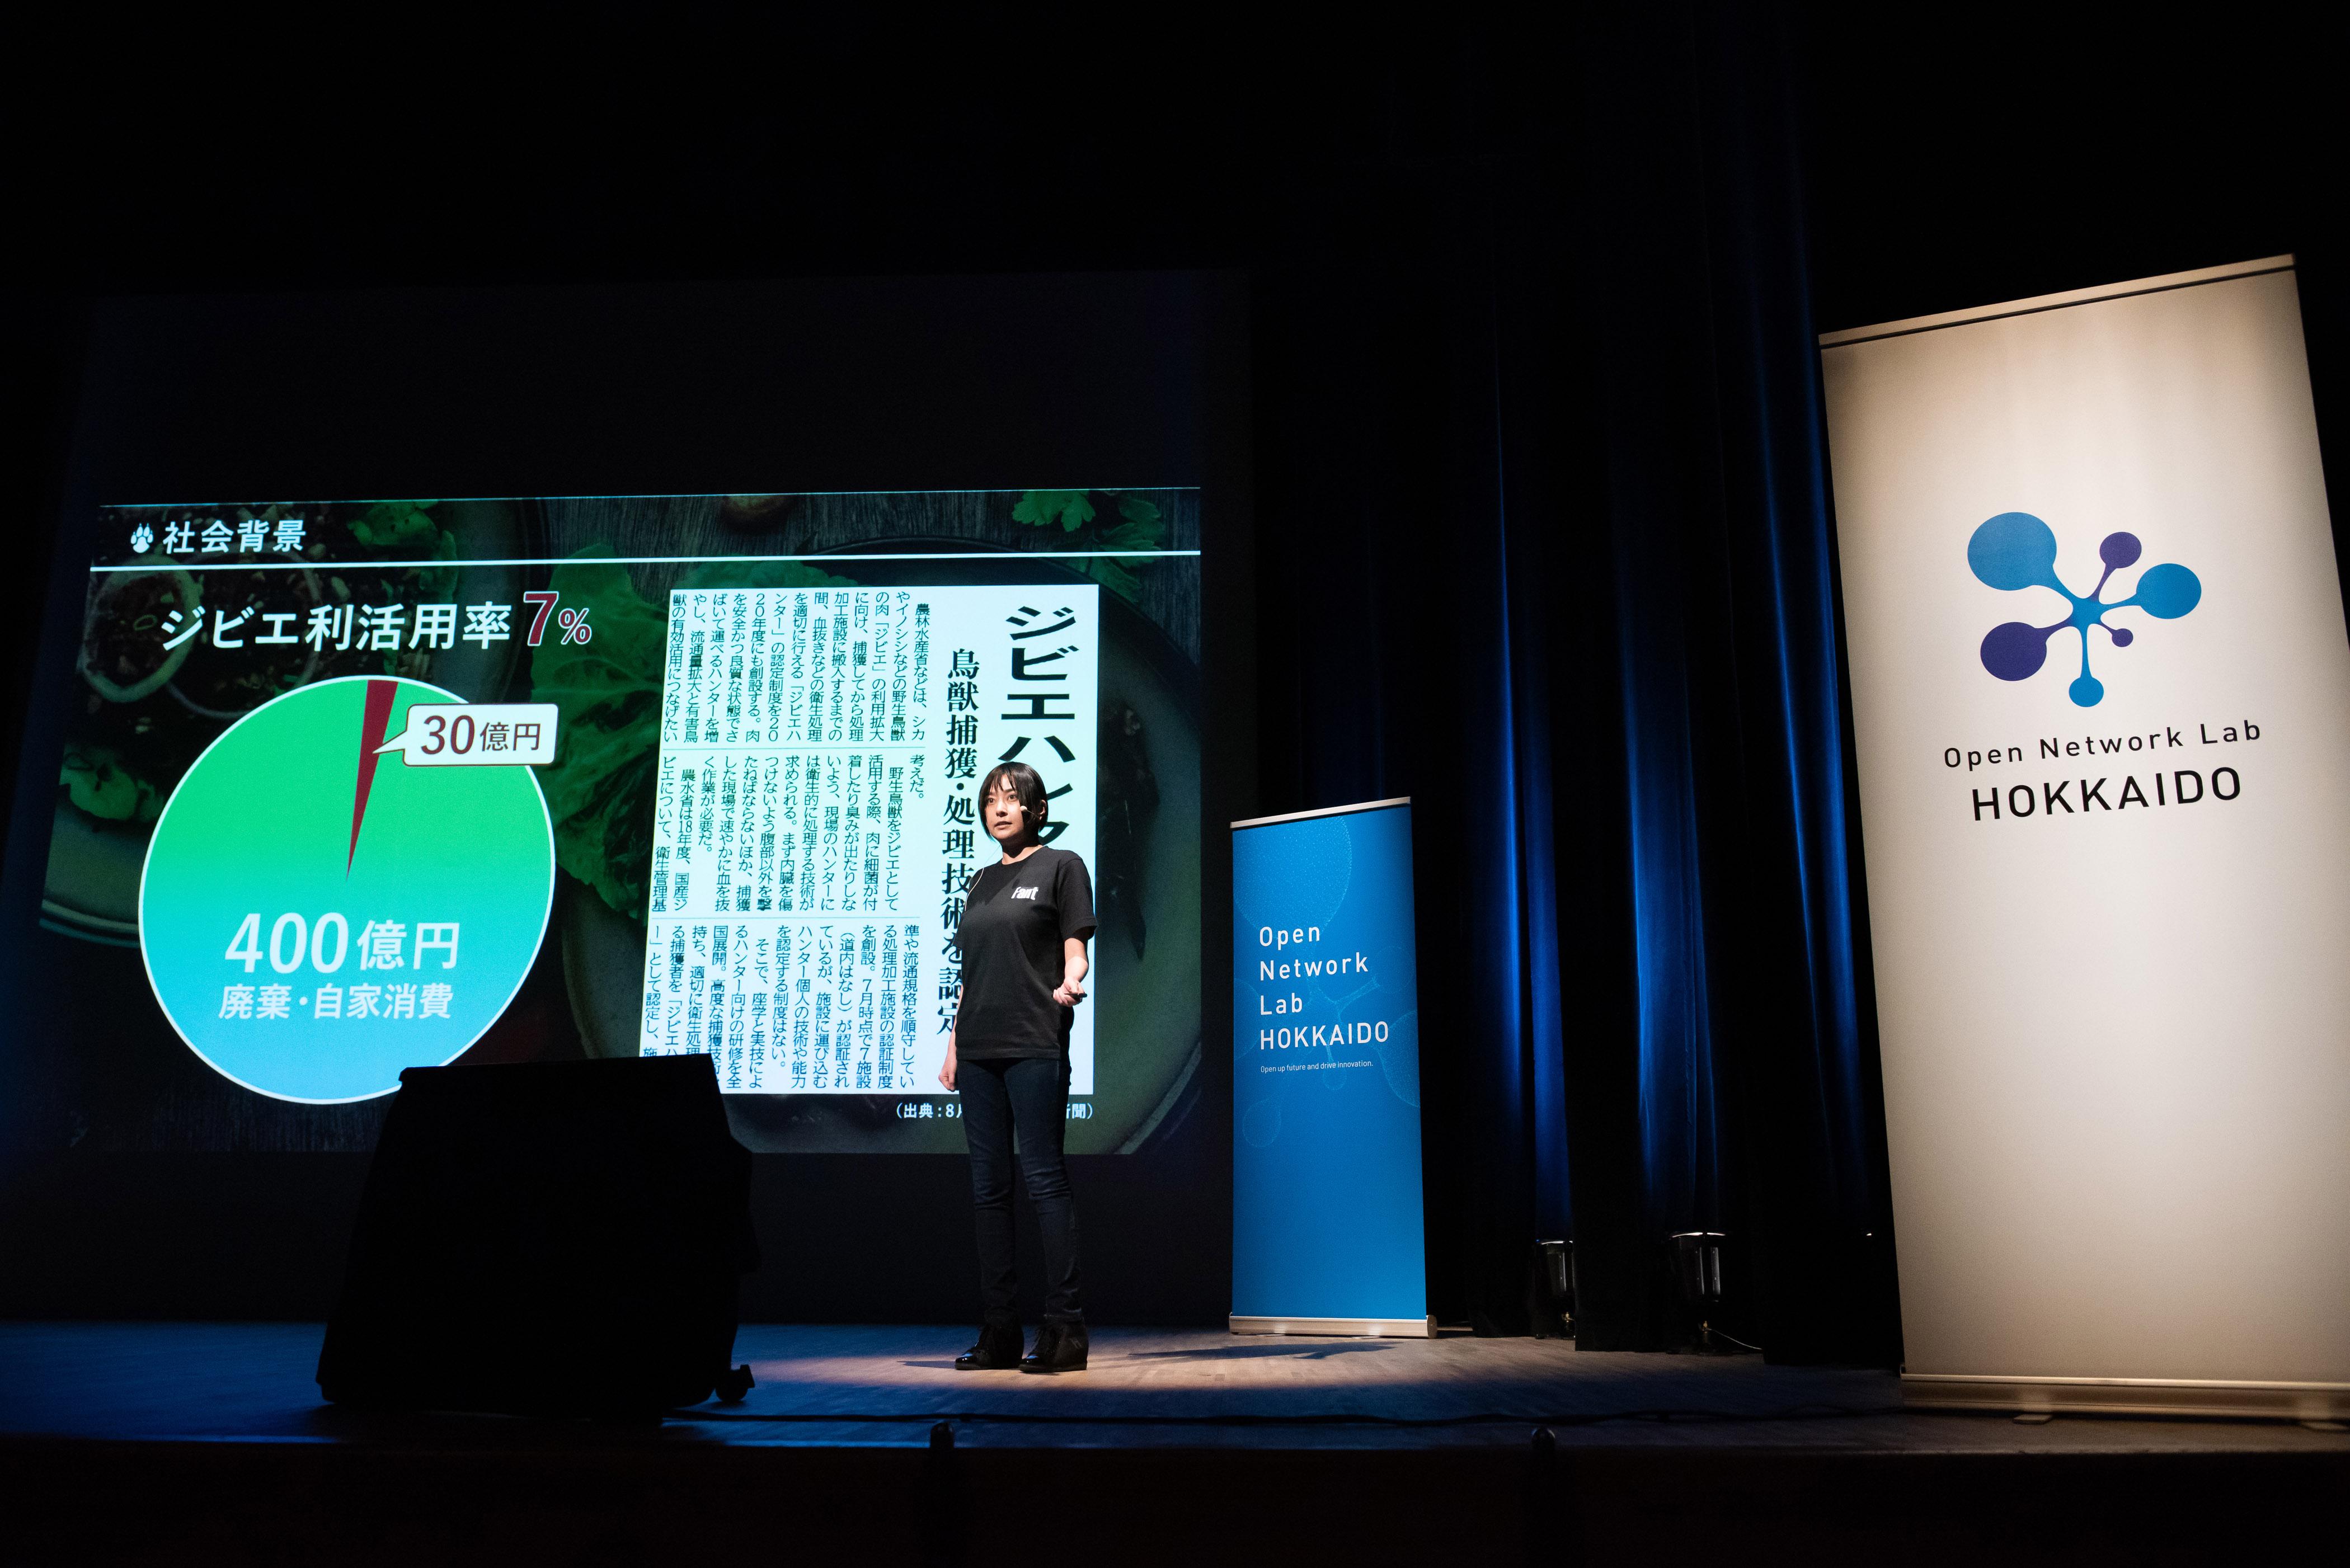 Open Network Lab Hokkaidoでピッチを行う株式会社Fantの高野沙月氏